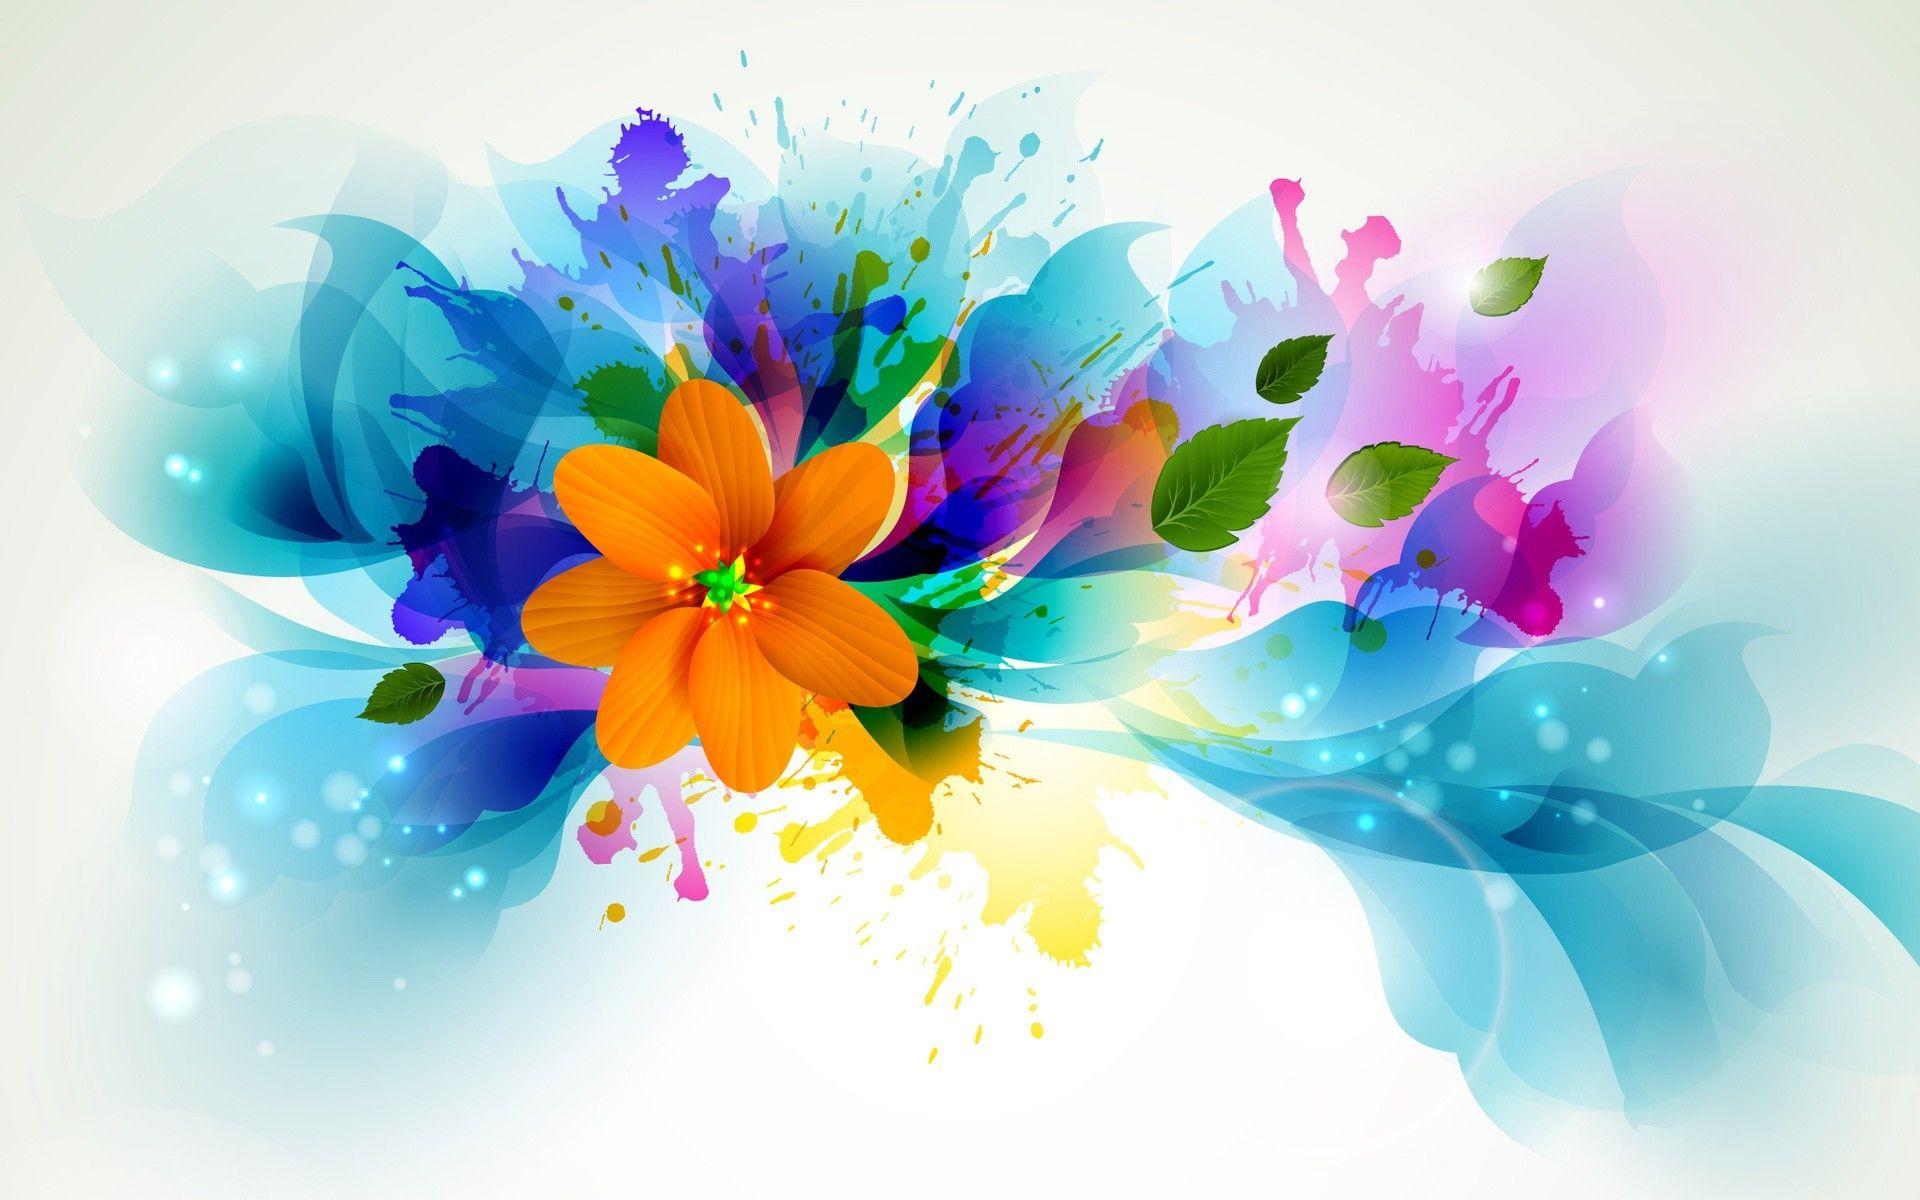 flowers, Artwork, Leaves, Paint Splatter Wallpapers HD